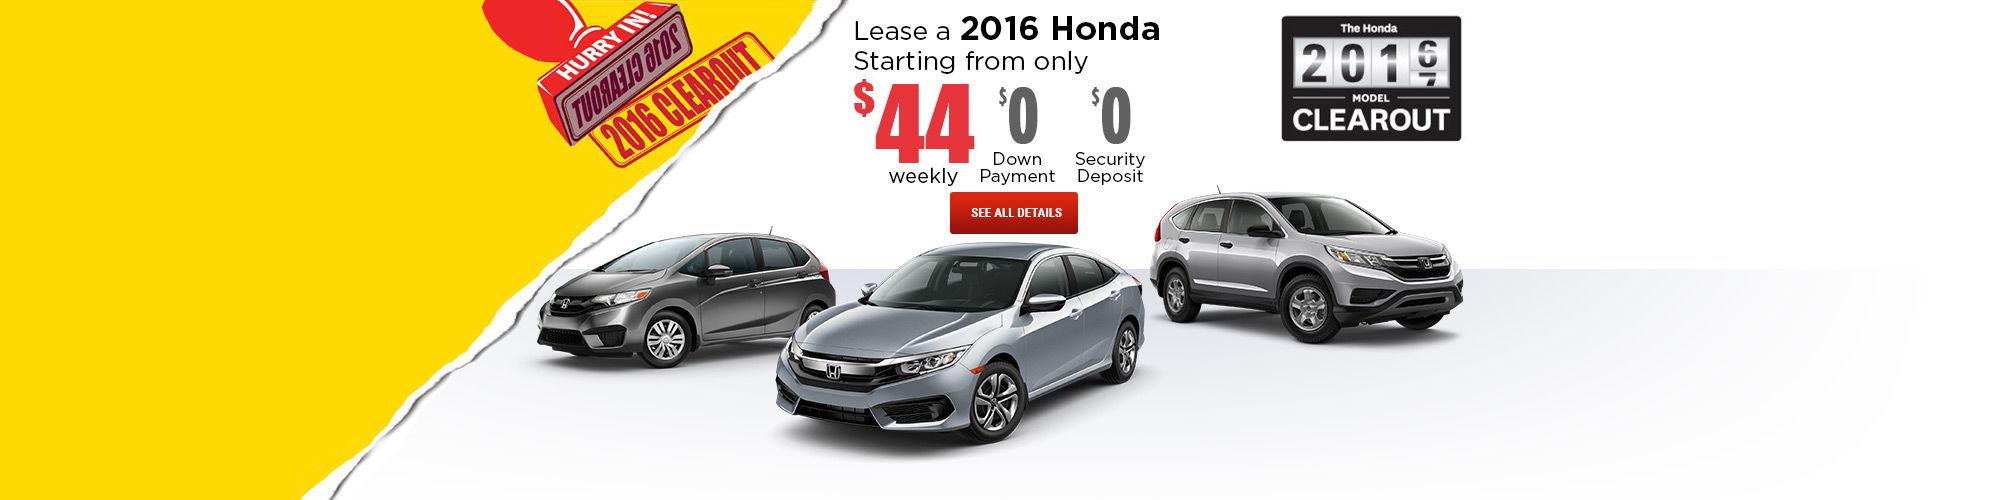 New honda ridgeline in st louis mo inventory photos videos for Honda dealership portland